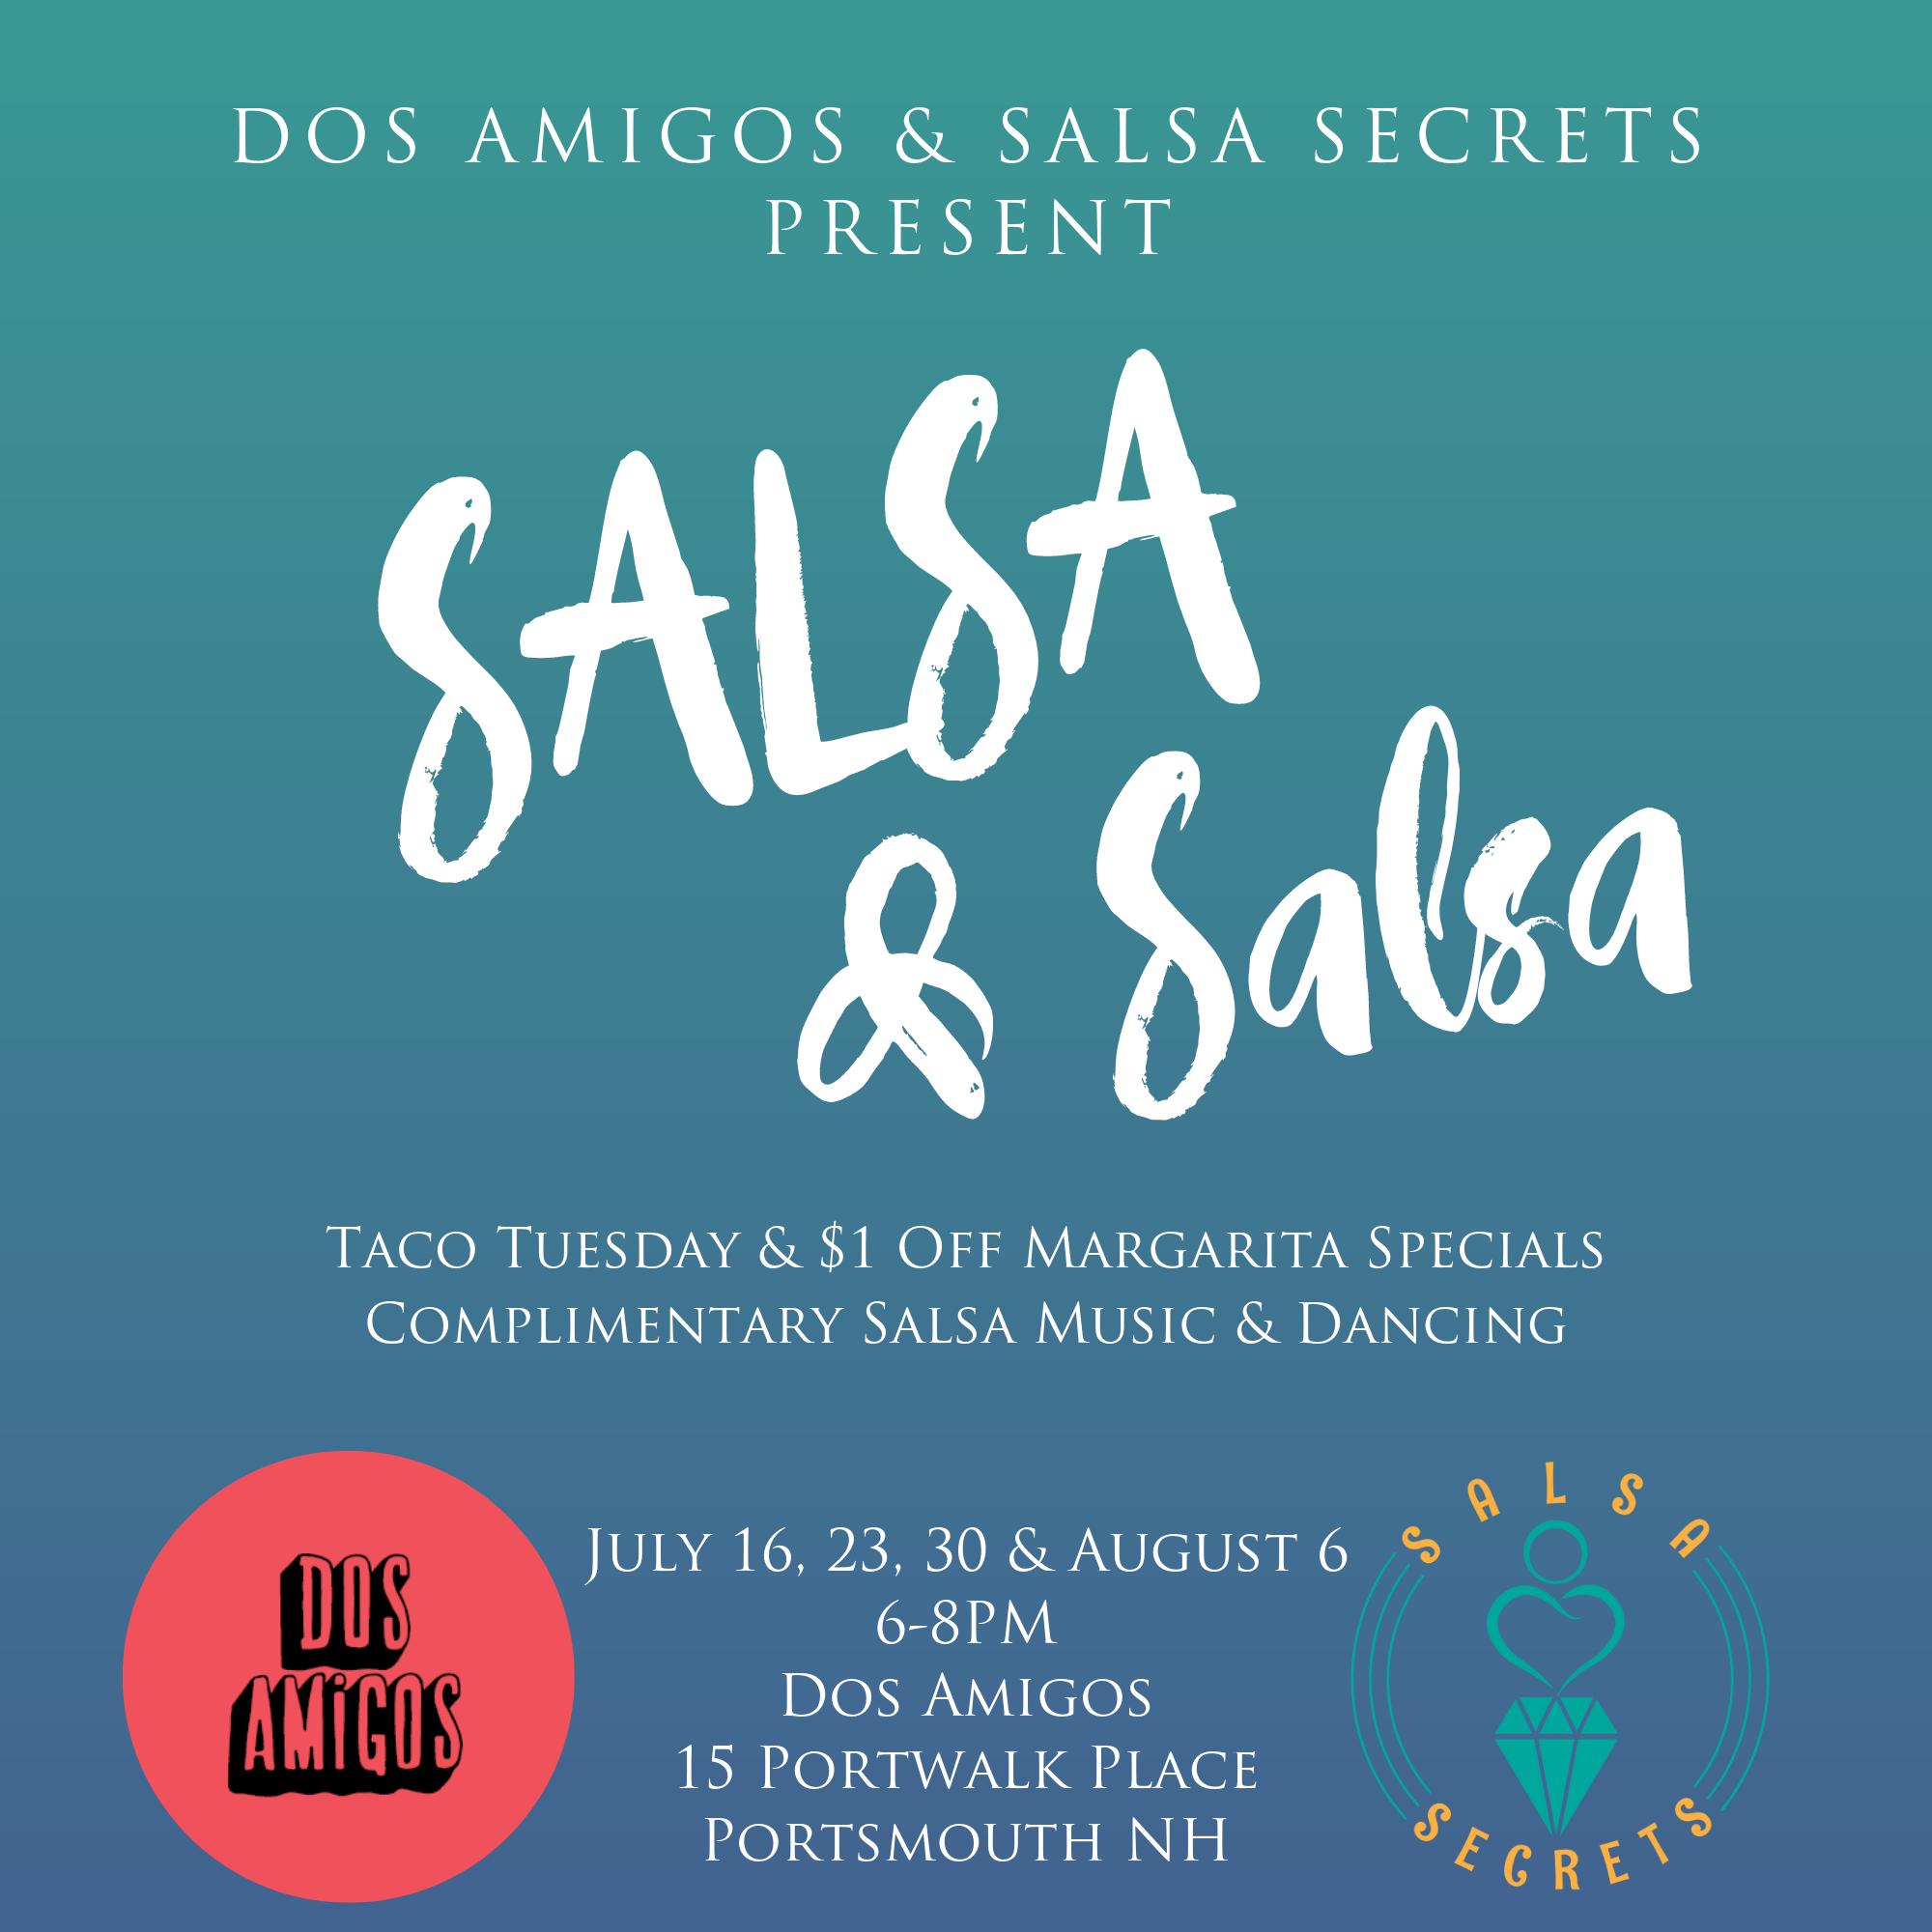 salsa dance dos amigos FREE SALSA